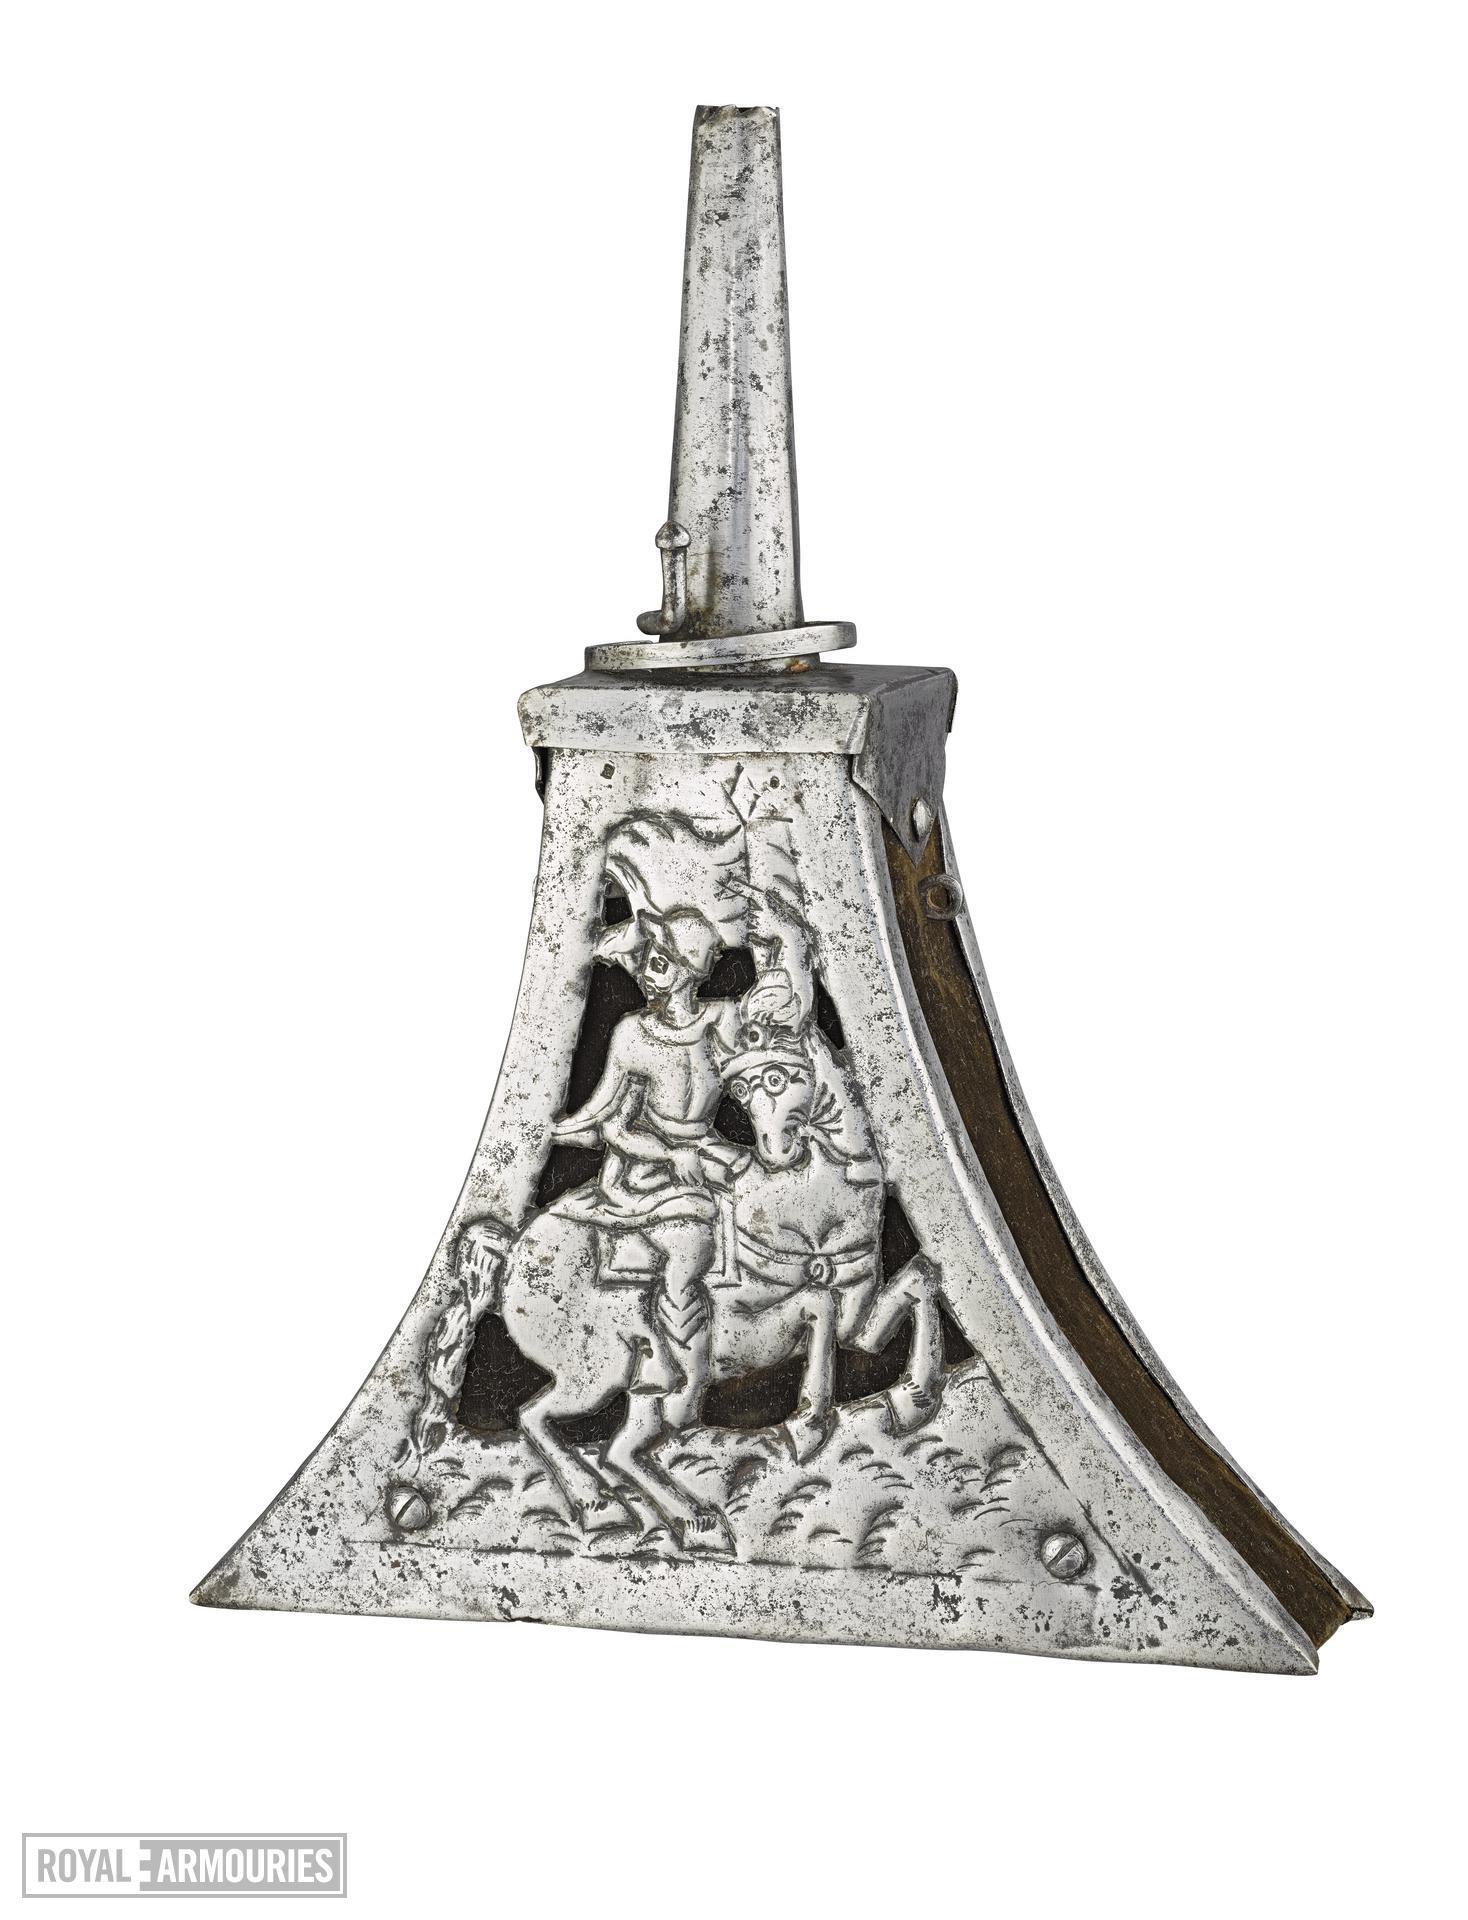 Priming flask of triangular shape, with steel mounts. XIII.11